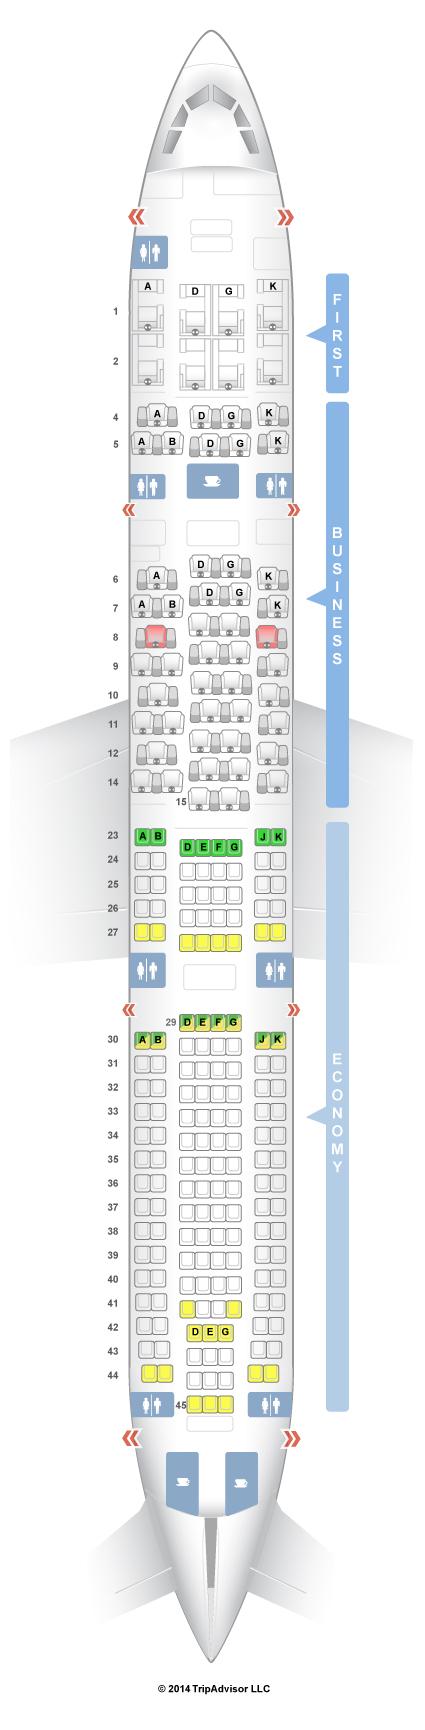 Fresh A340 300 Seating Chart